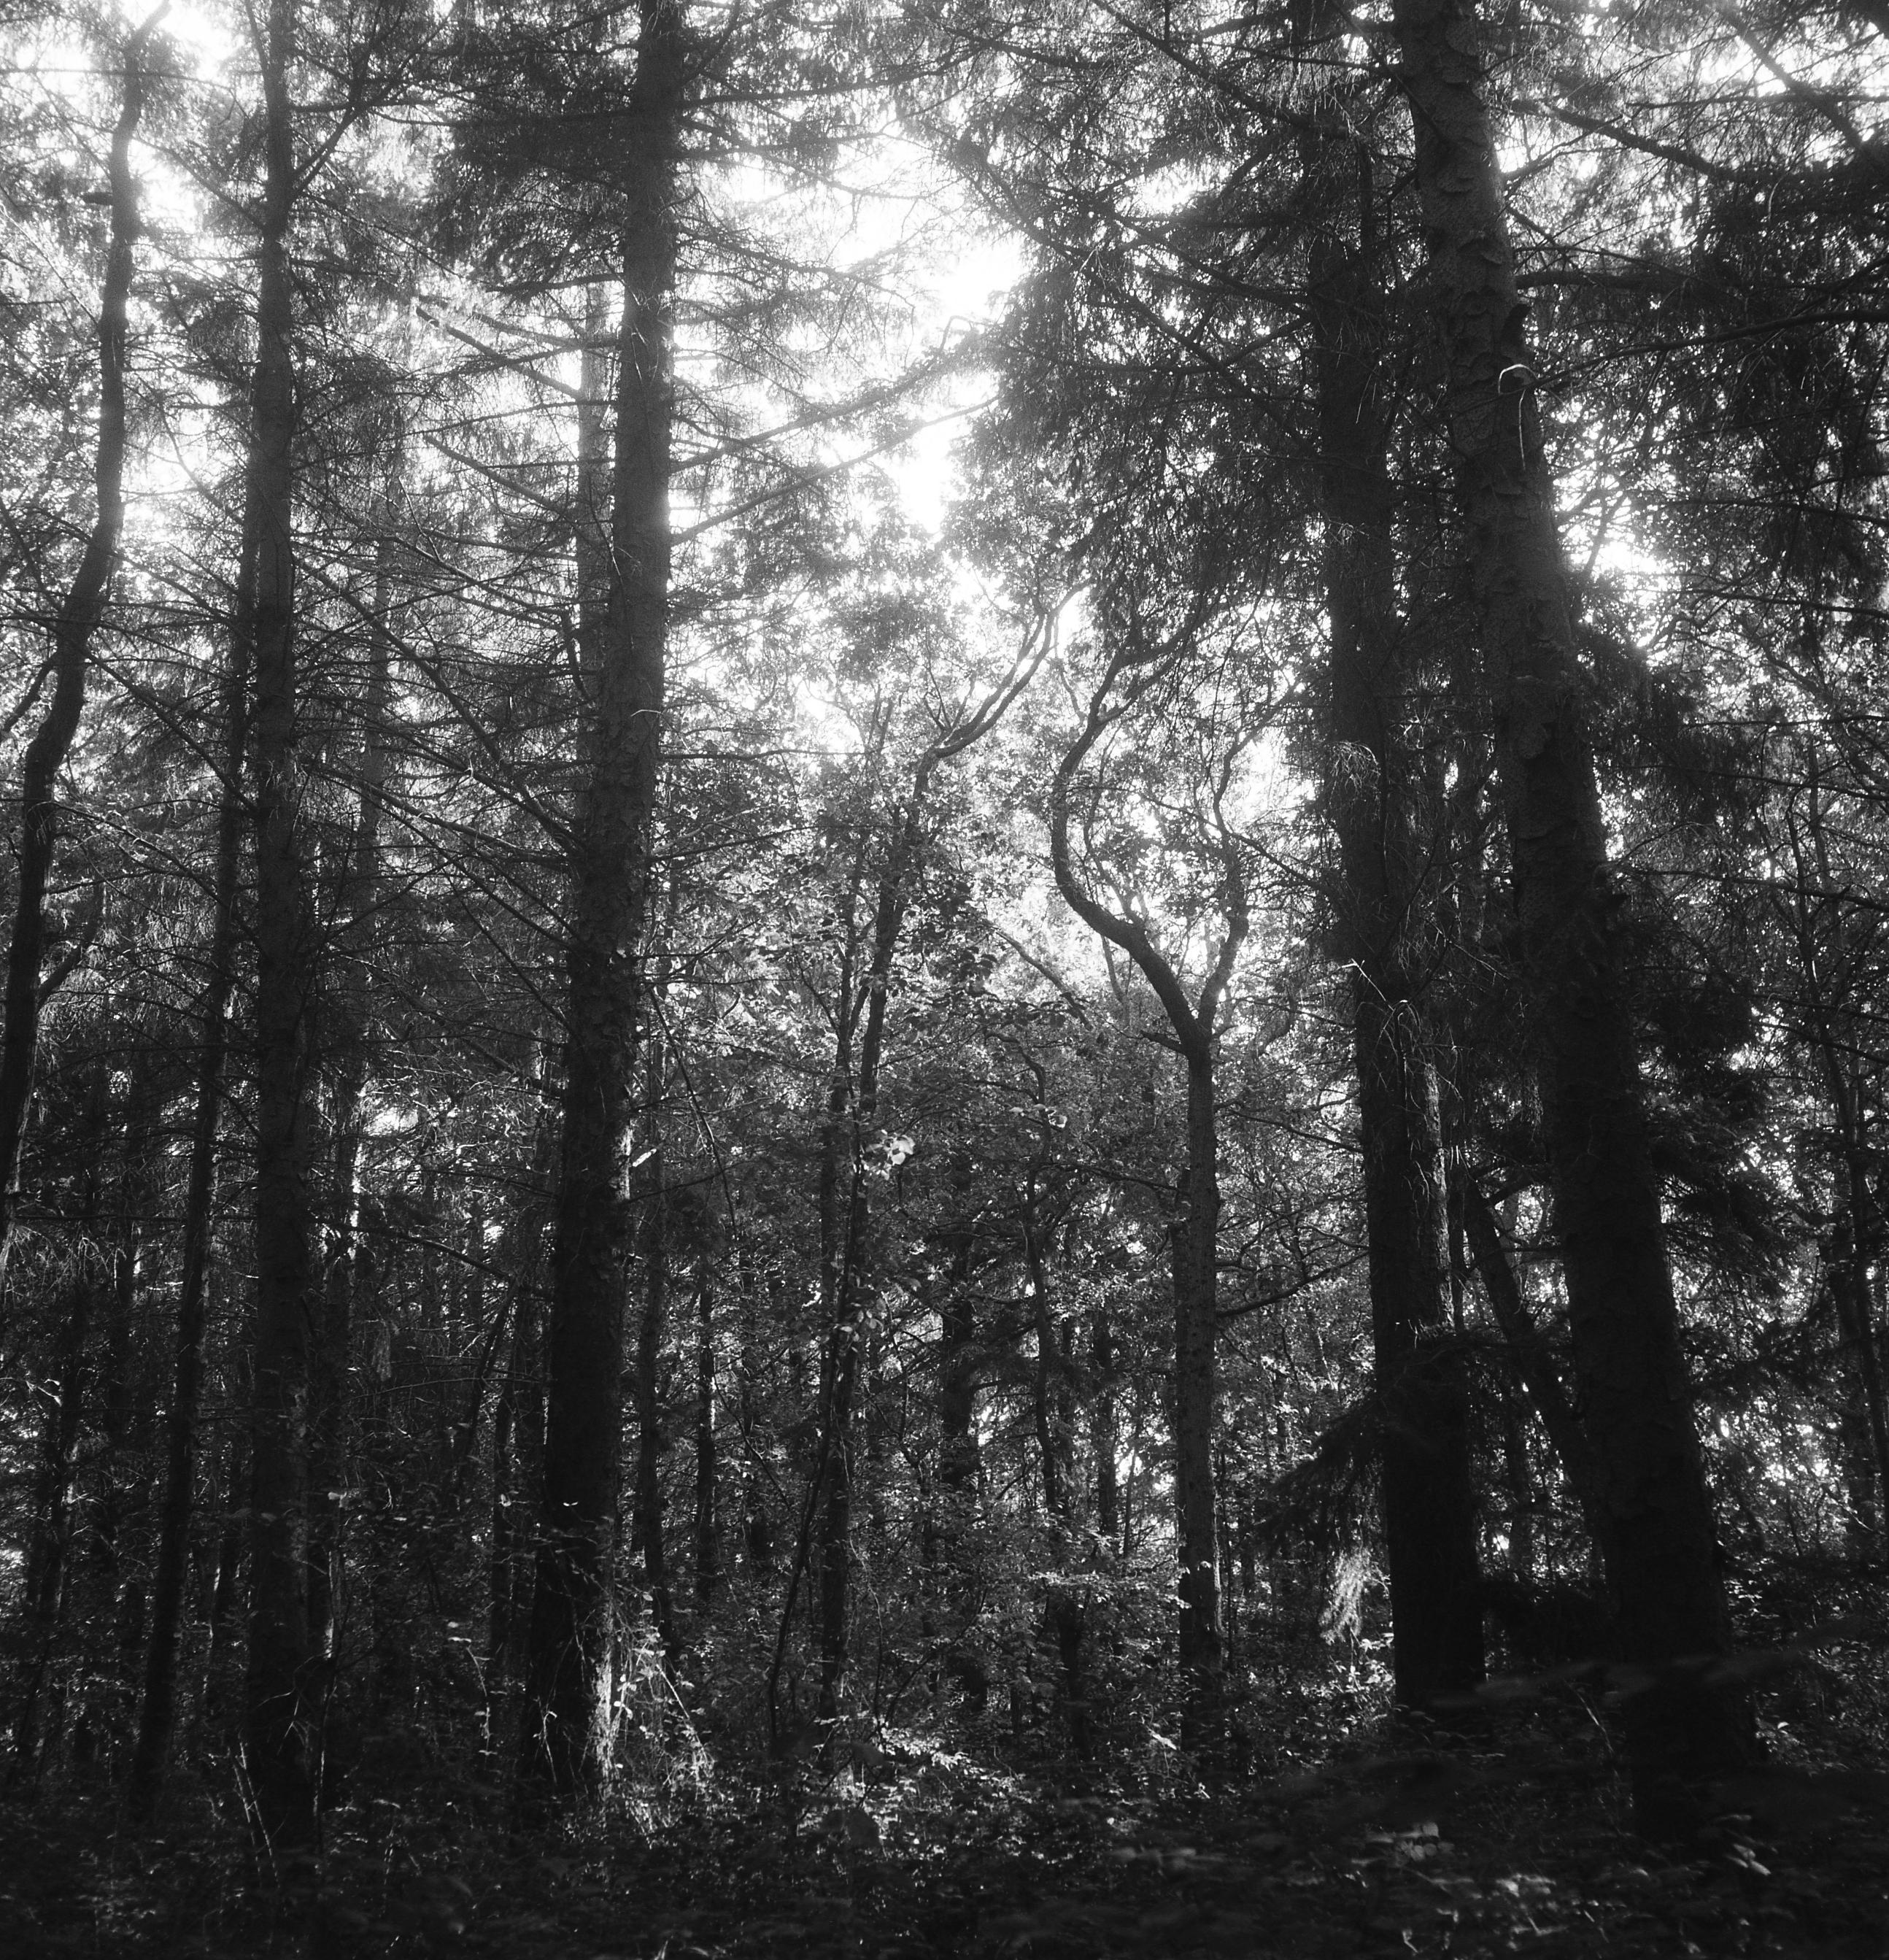 Vlieland bomenland